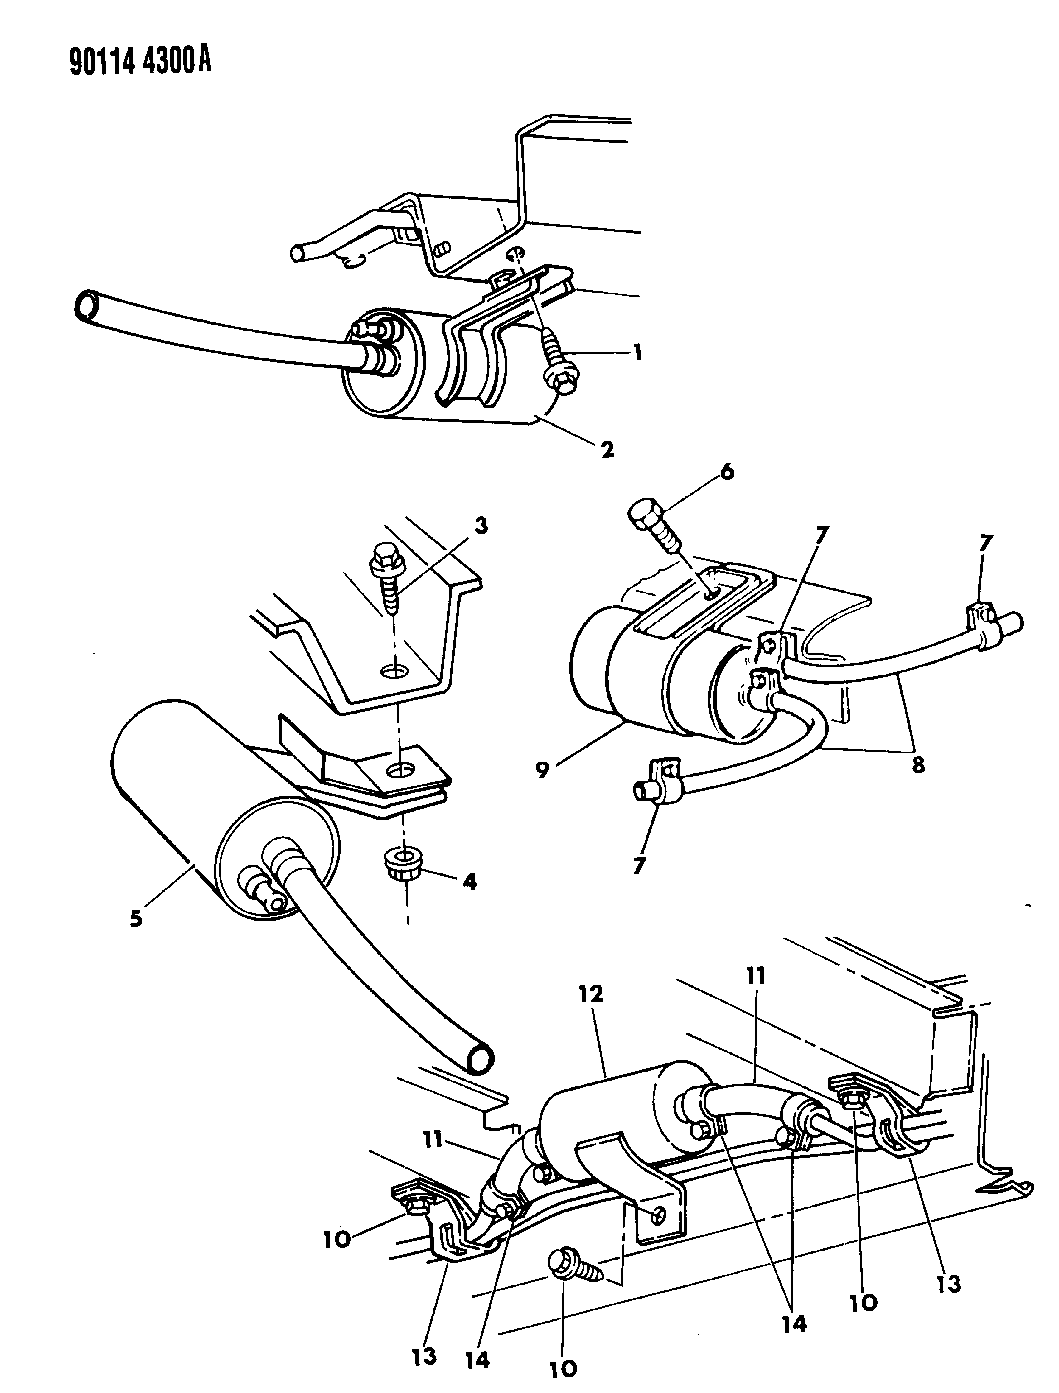 1990 Dodge Omni Fuel Filter Mopar Parts Giant Wiring Diagram